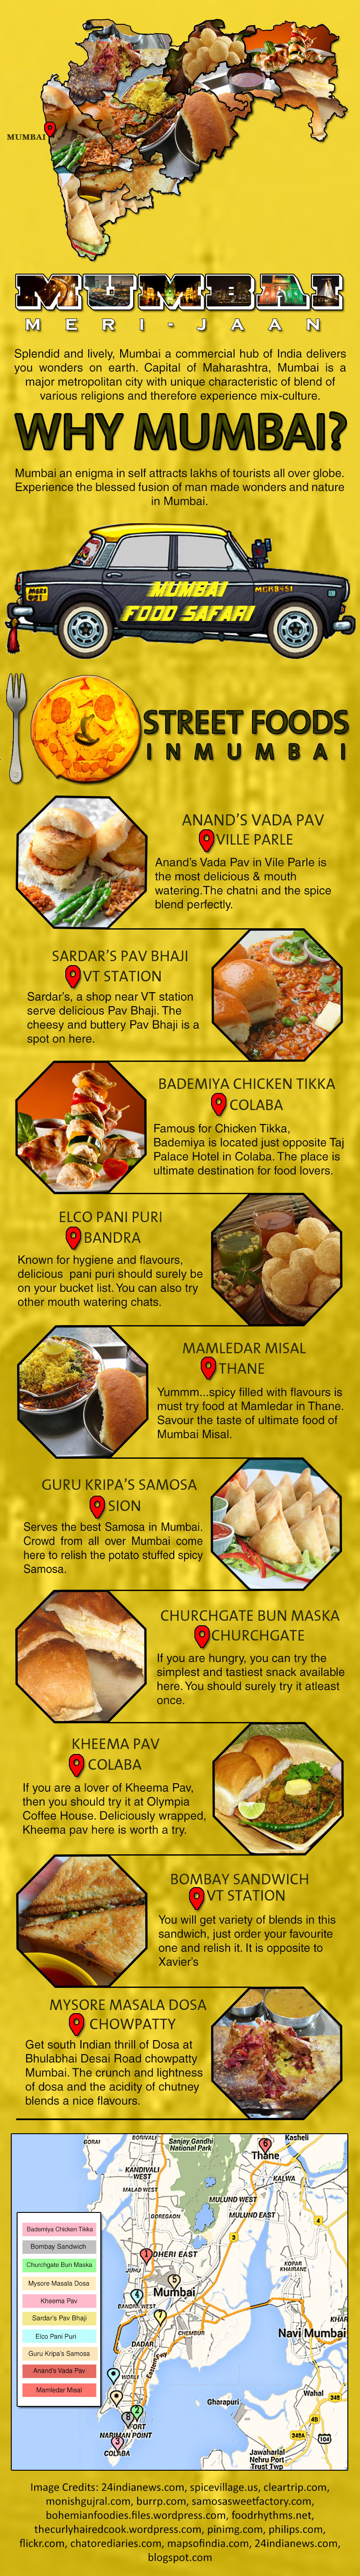 Fish aquarium in vile parle timing - Top 10 Street Food To Enjoy In Mumbai